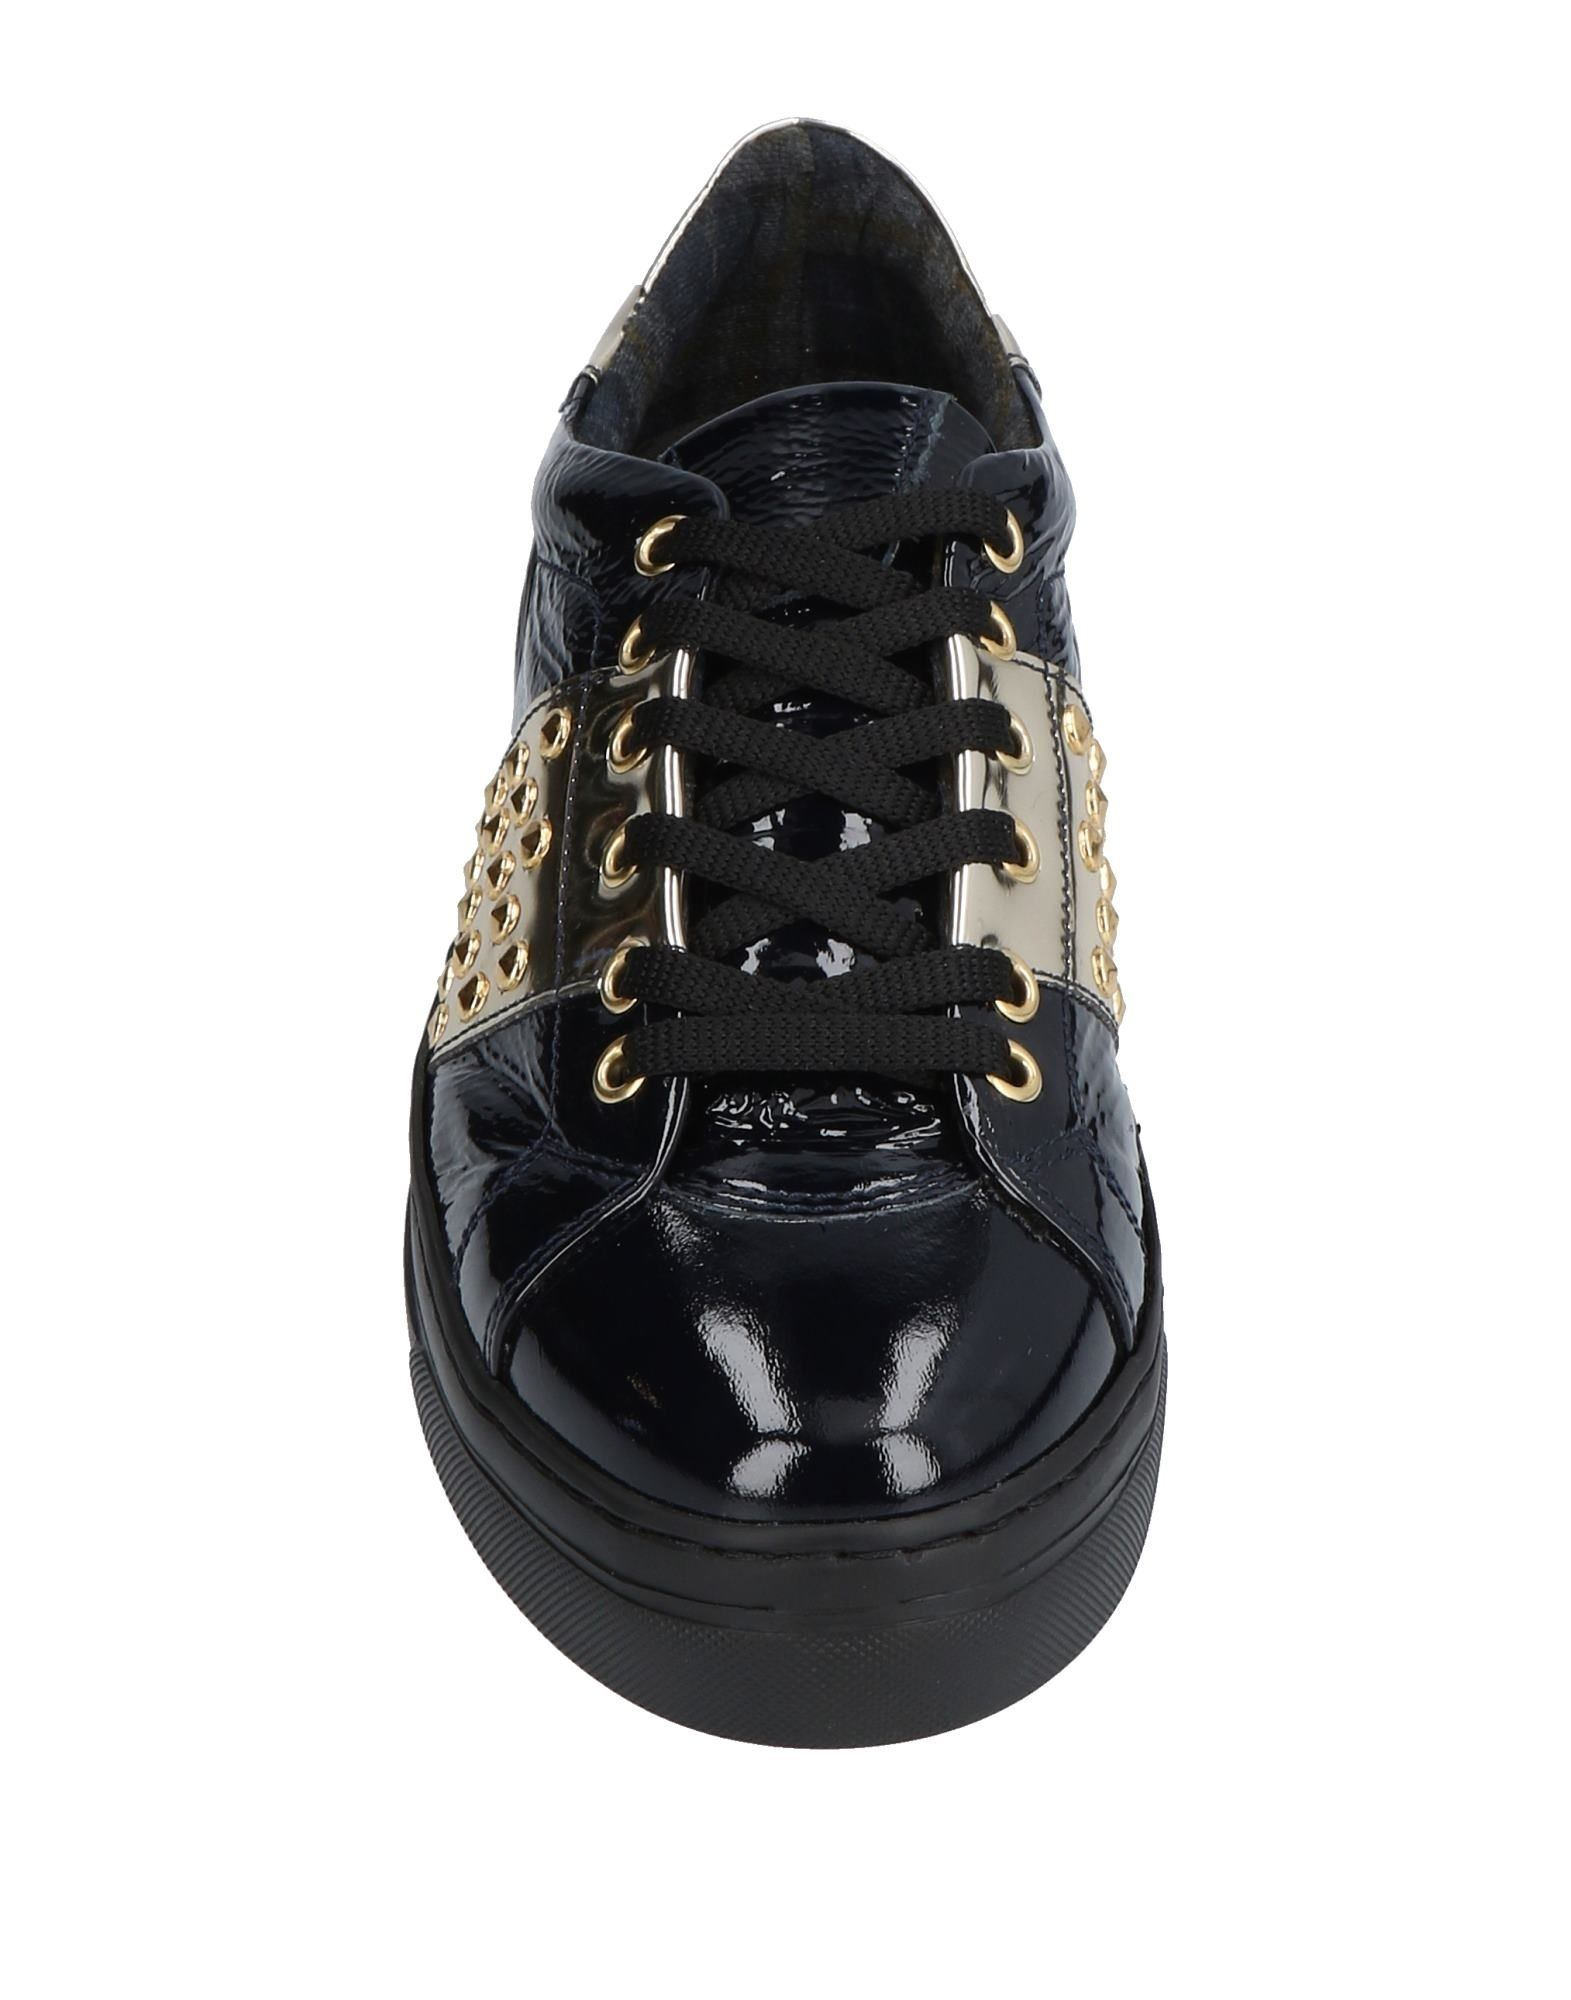 Spaziomoda Sneakers Damen  11448331GS Gute Gute 11448331GS Qualität beliebte Schuhe c72bcf